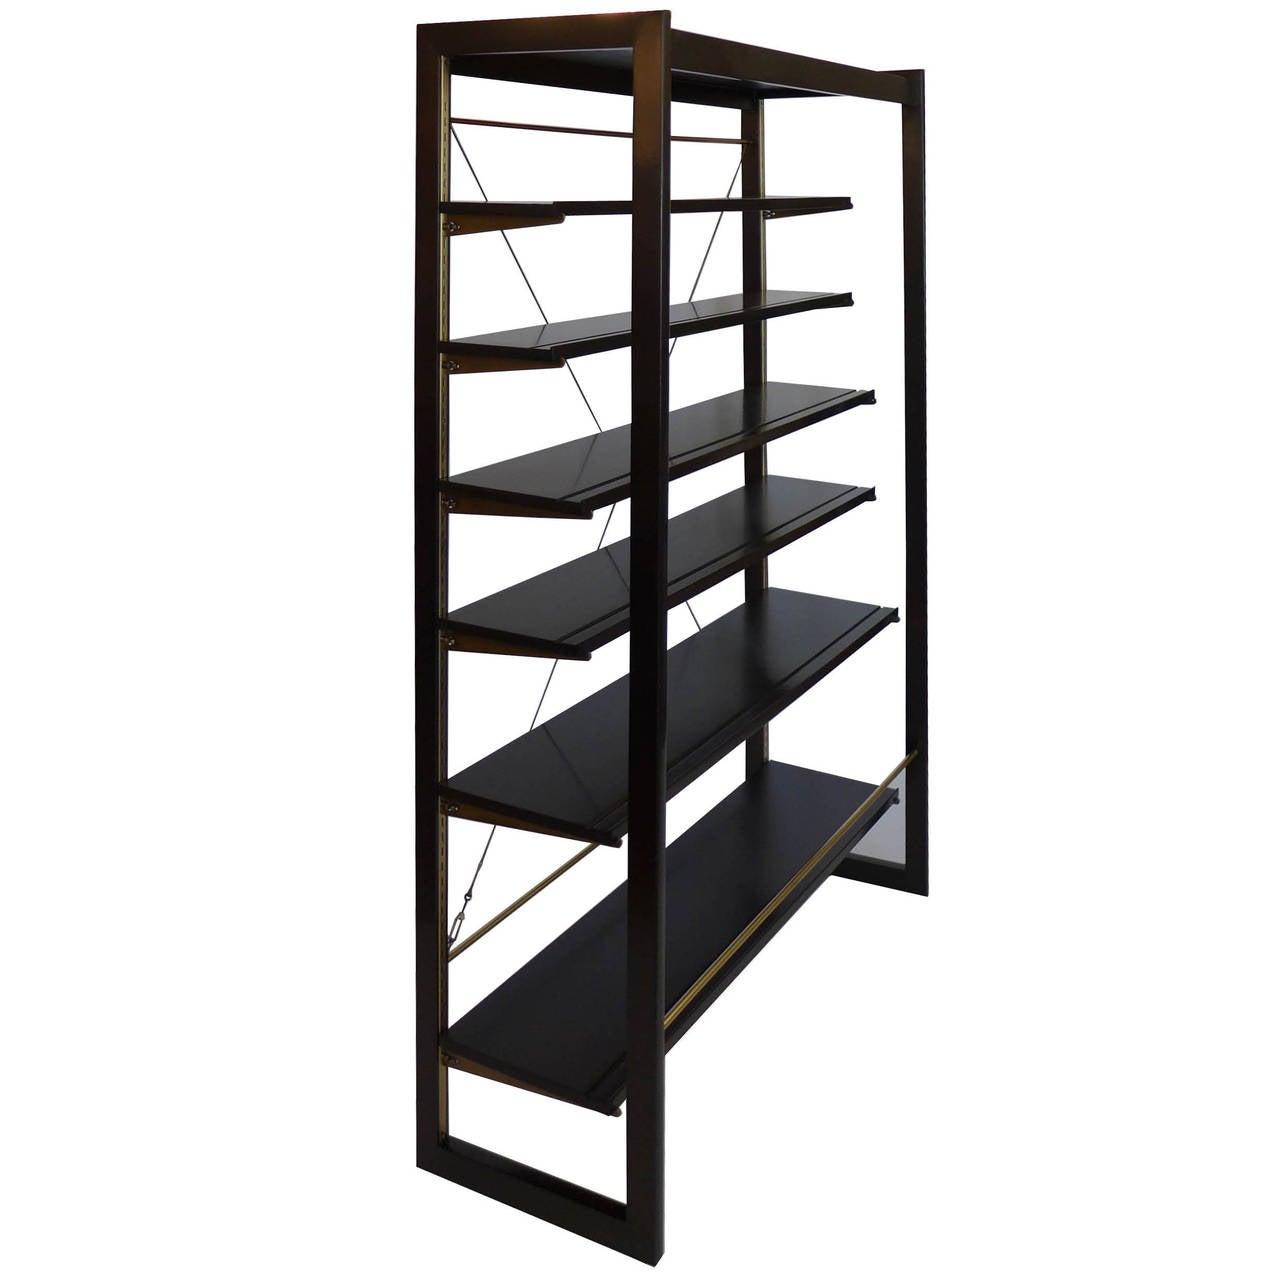 Rare Edward Wormley Open Frame Lit Shelf Room Divider for Dunbar 2